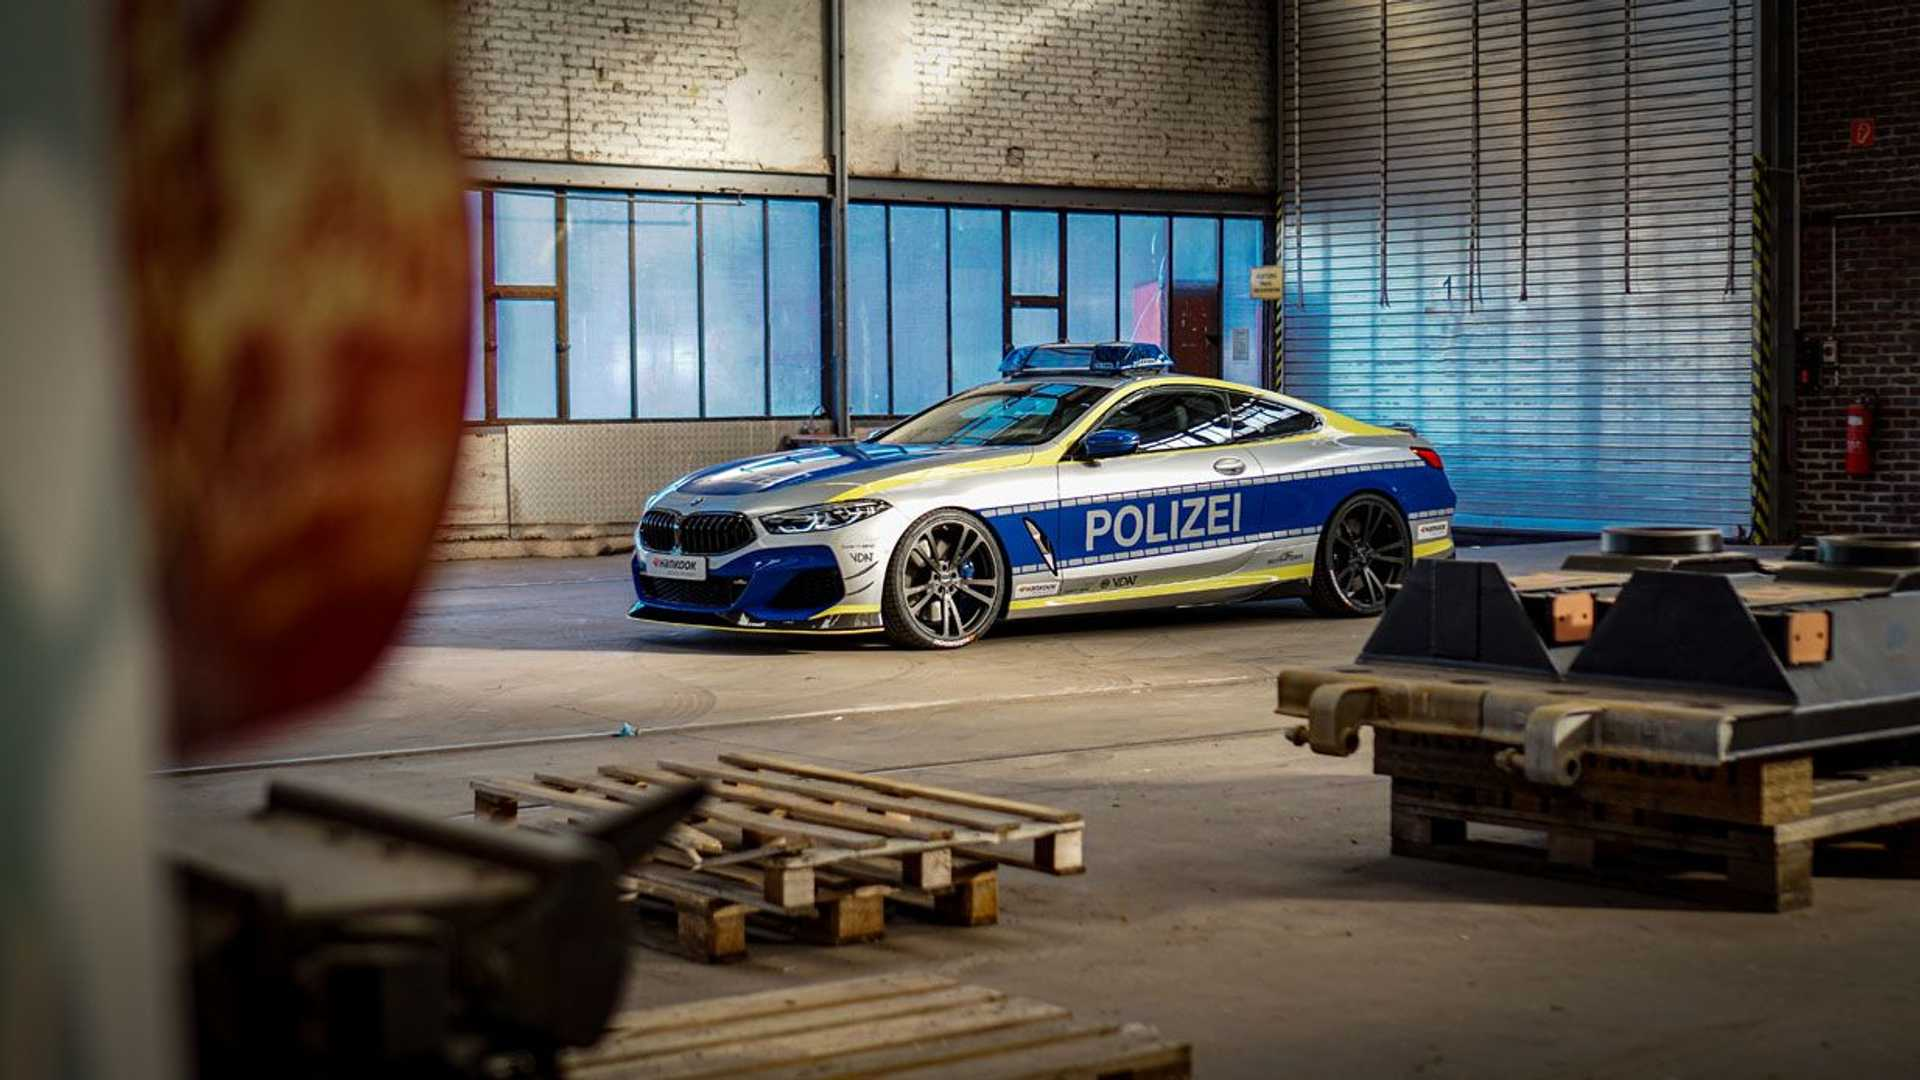 BMW-M850i-police-car-tune-it-safe-18